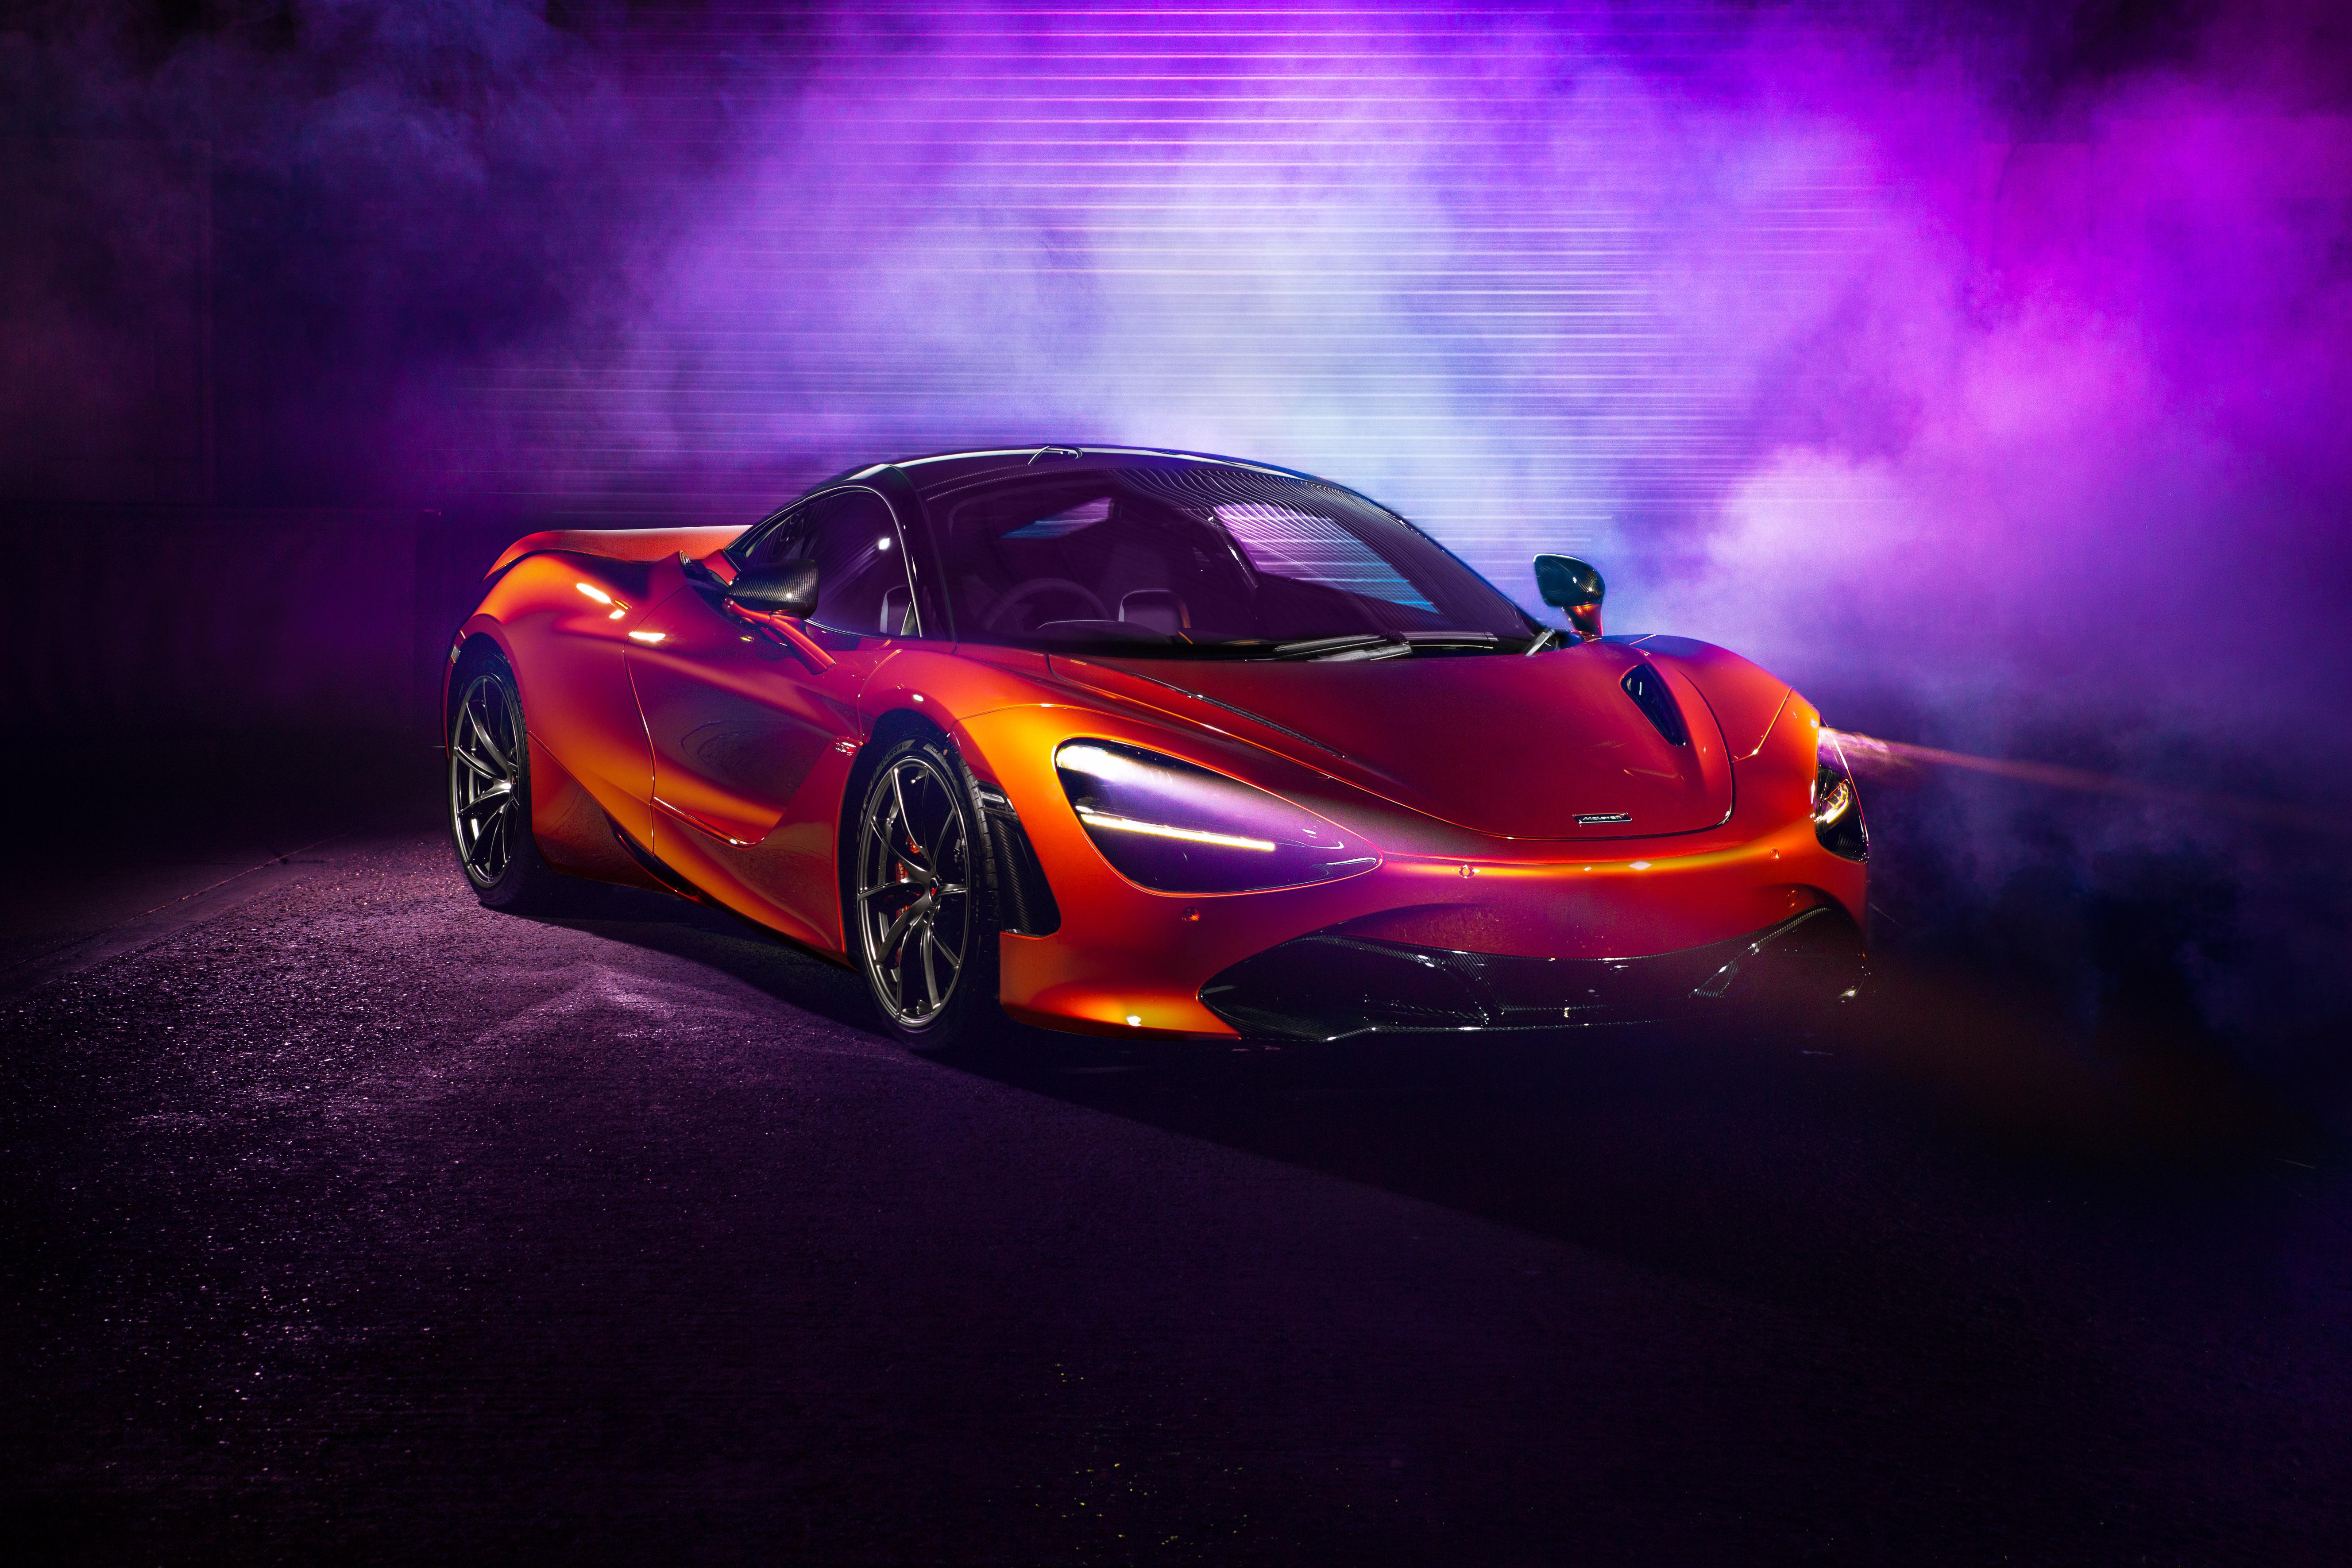 Mclaren 5k, HD Cars, 4k Wallpapers, Images, Backgrounds ...